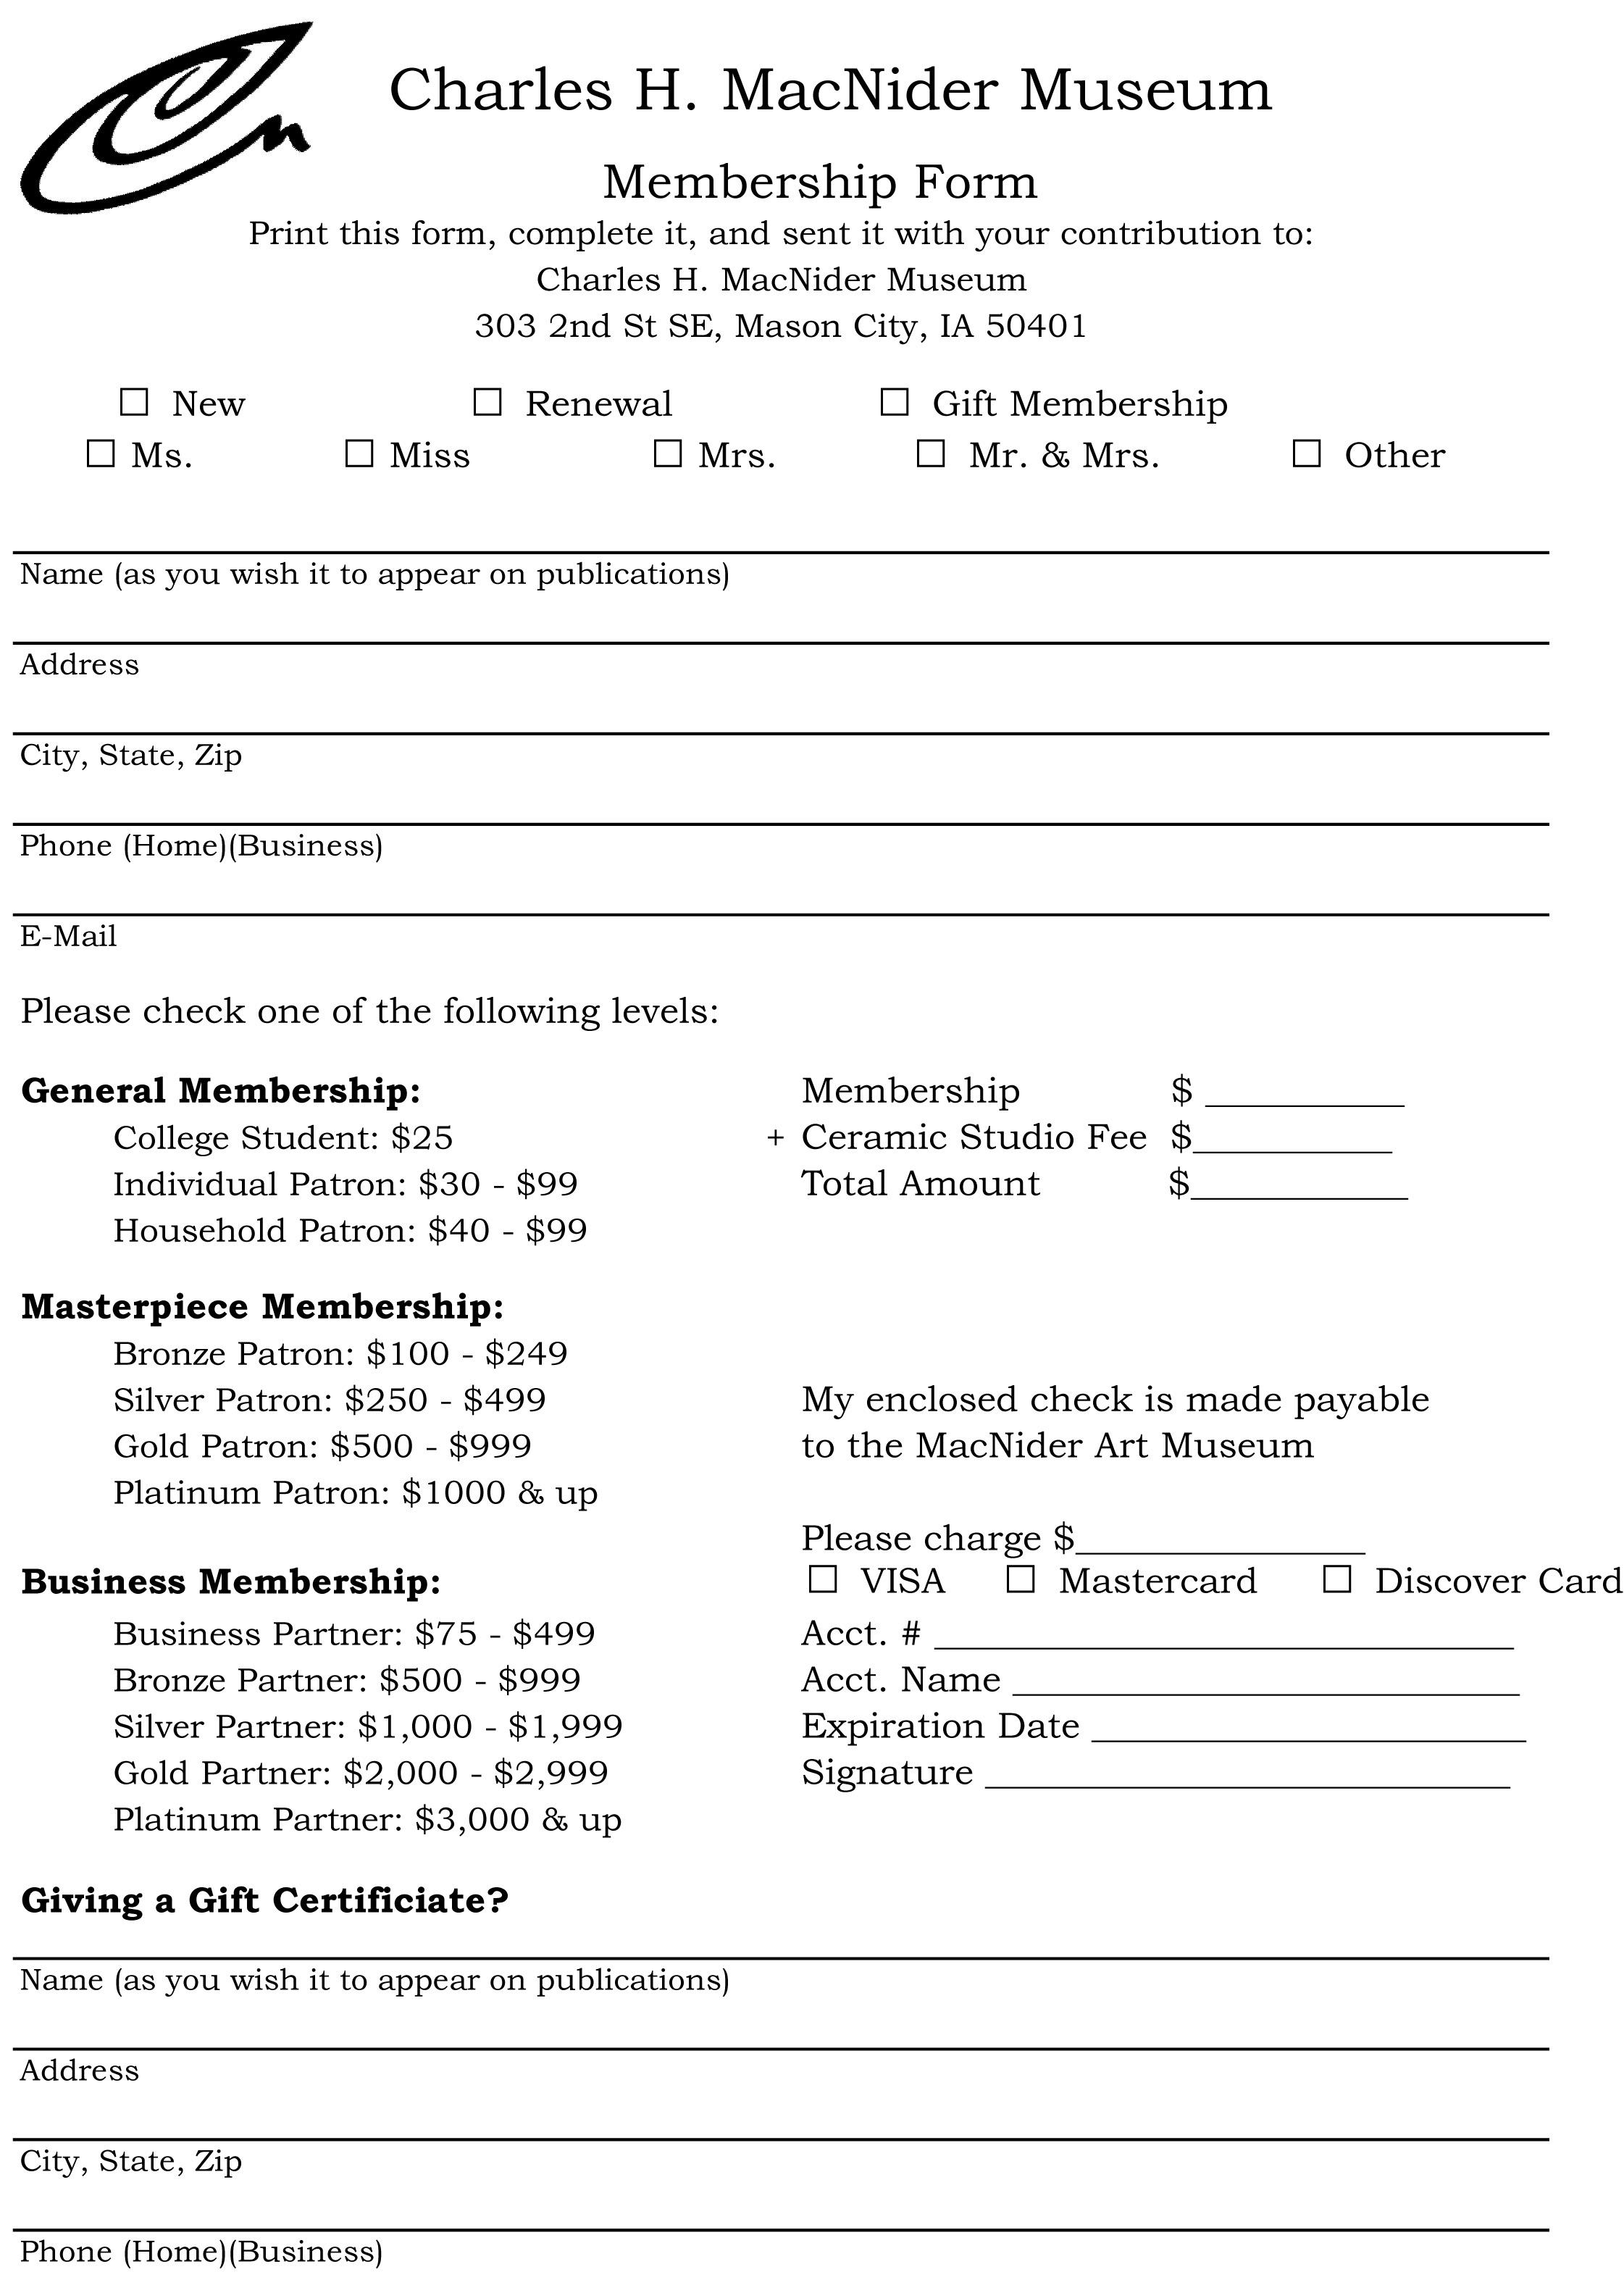 Membership Form.xls